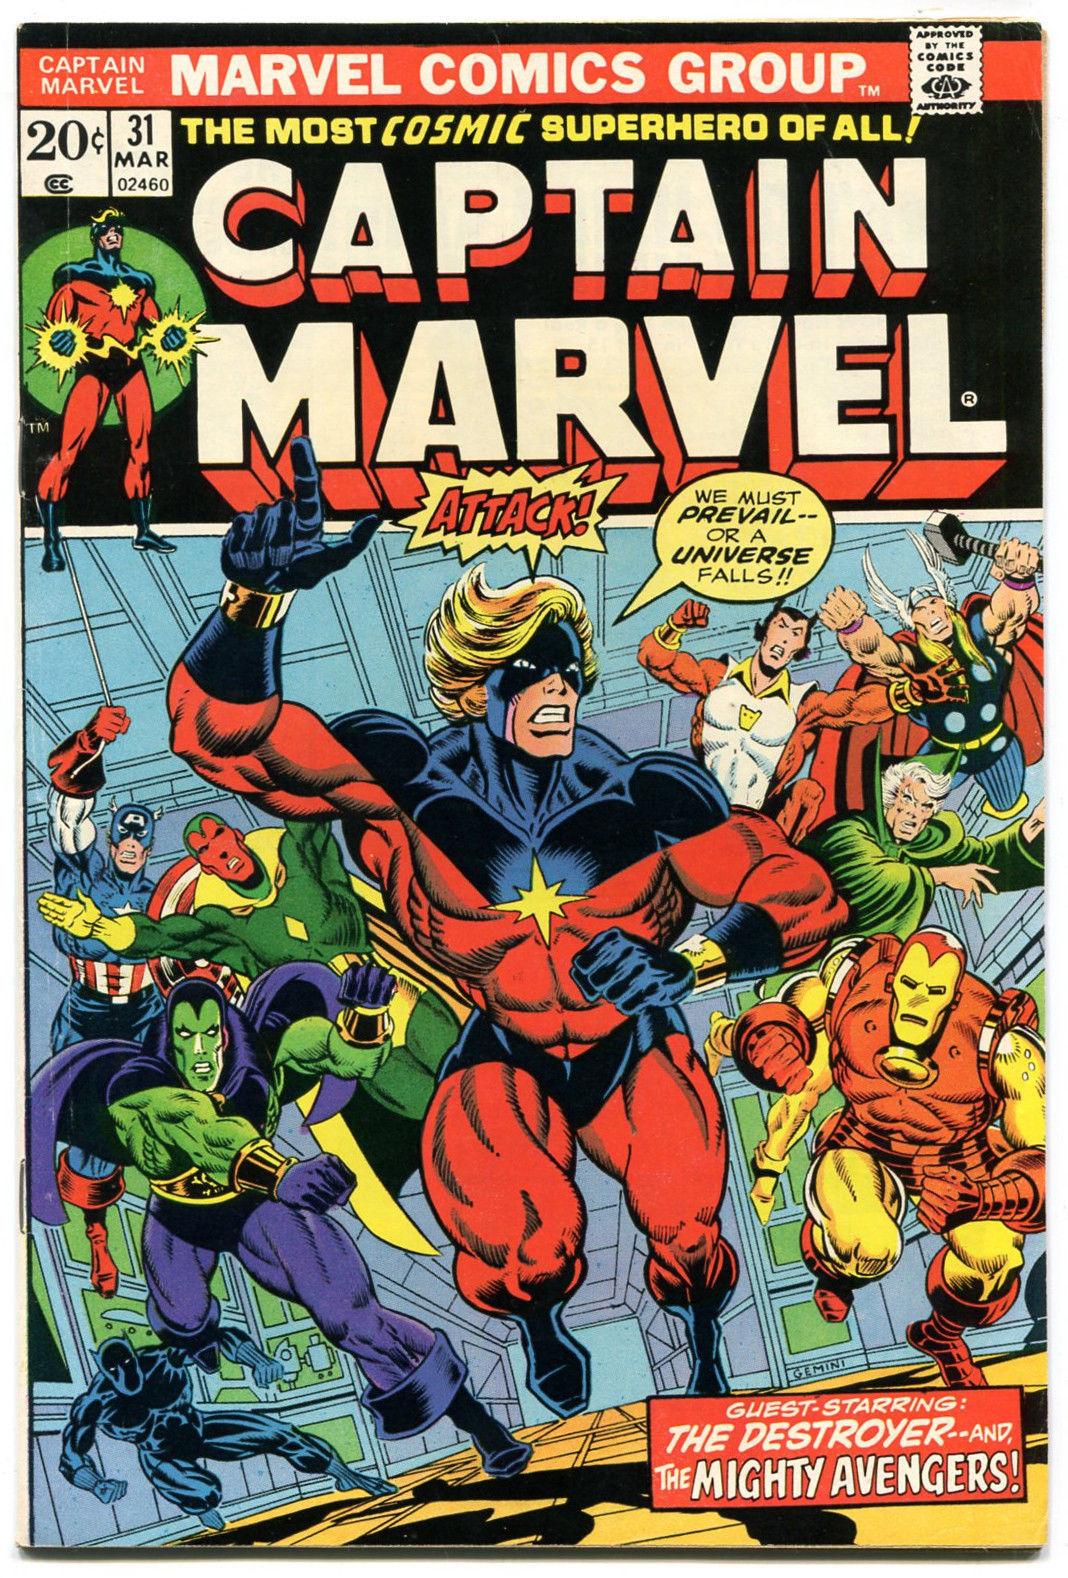 CAPTAIN MARVEL 31 NM 9.2 1973 Marvel Jim Starlin Avengers Thanos Death